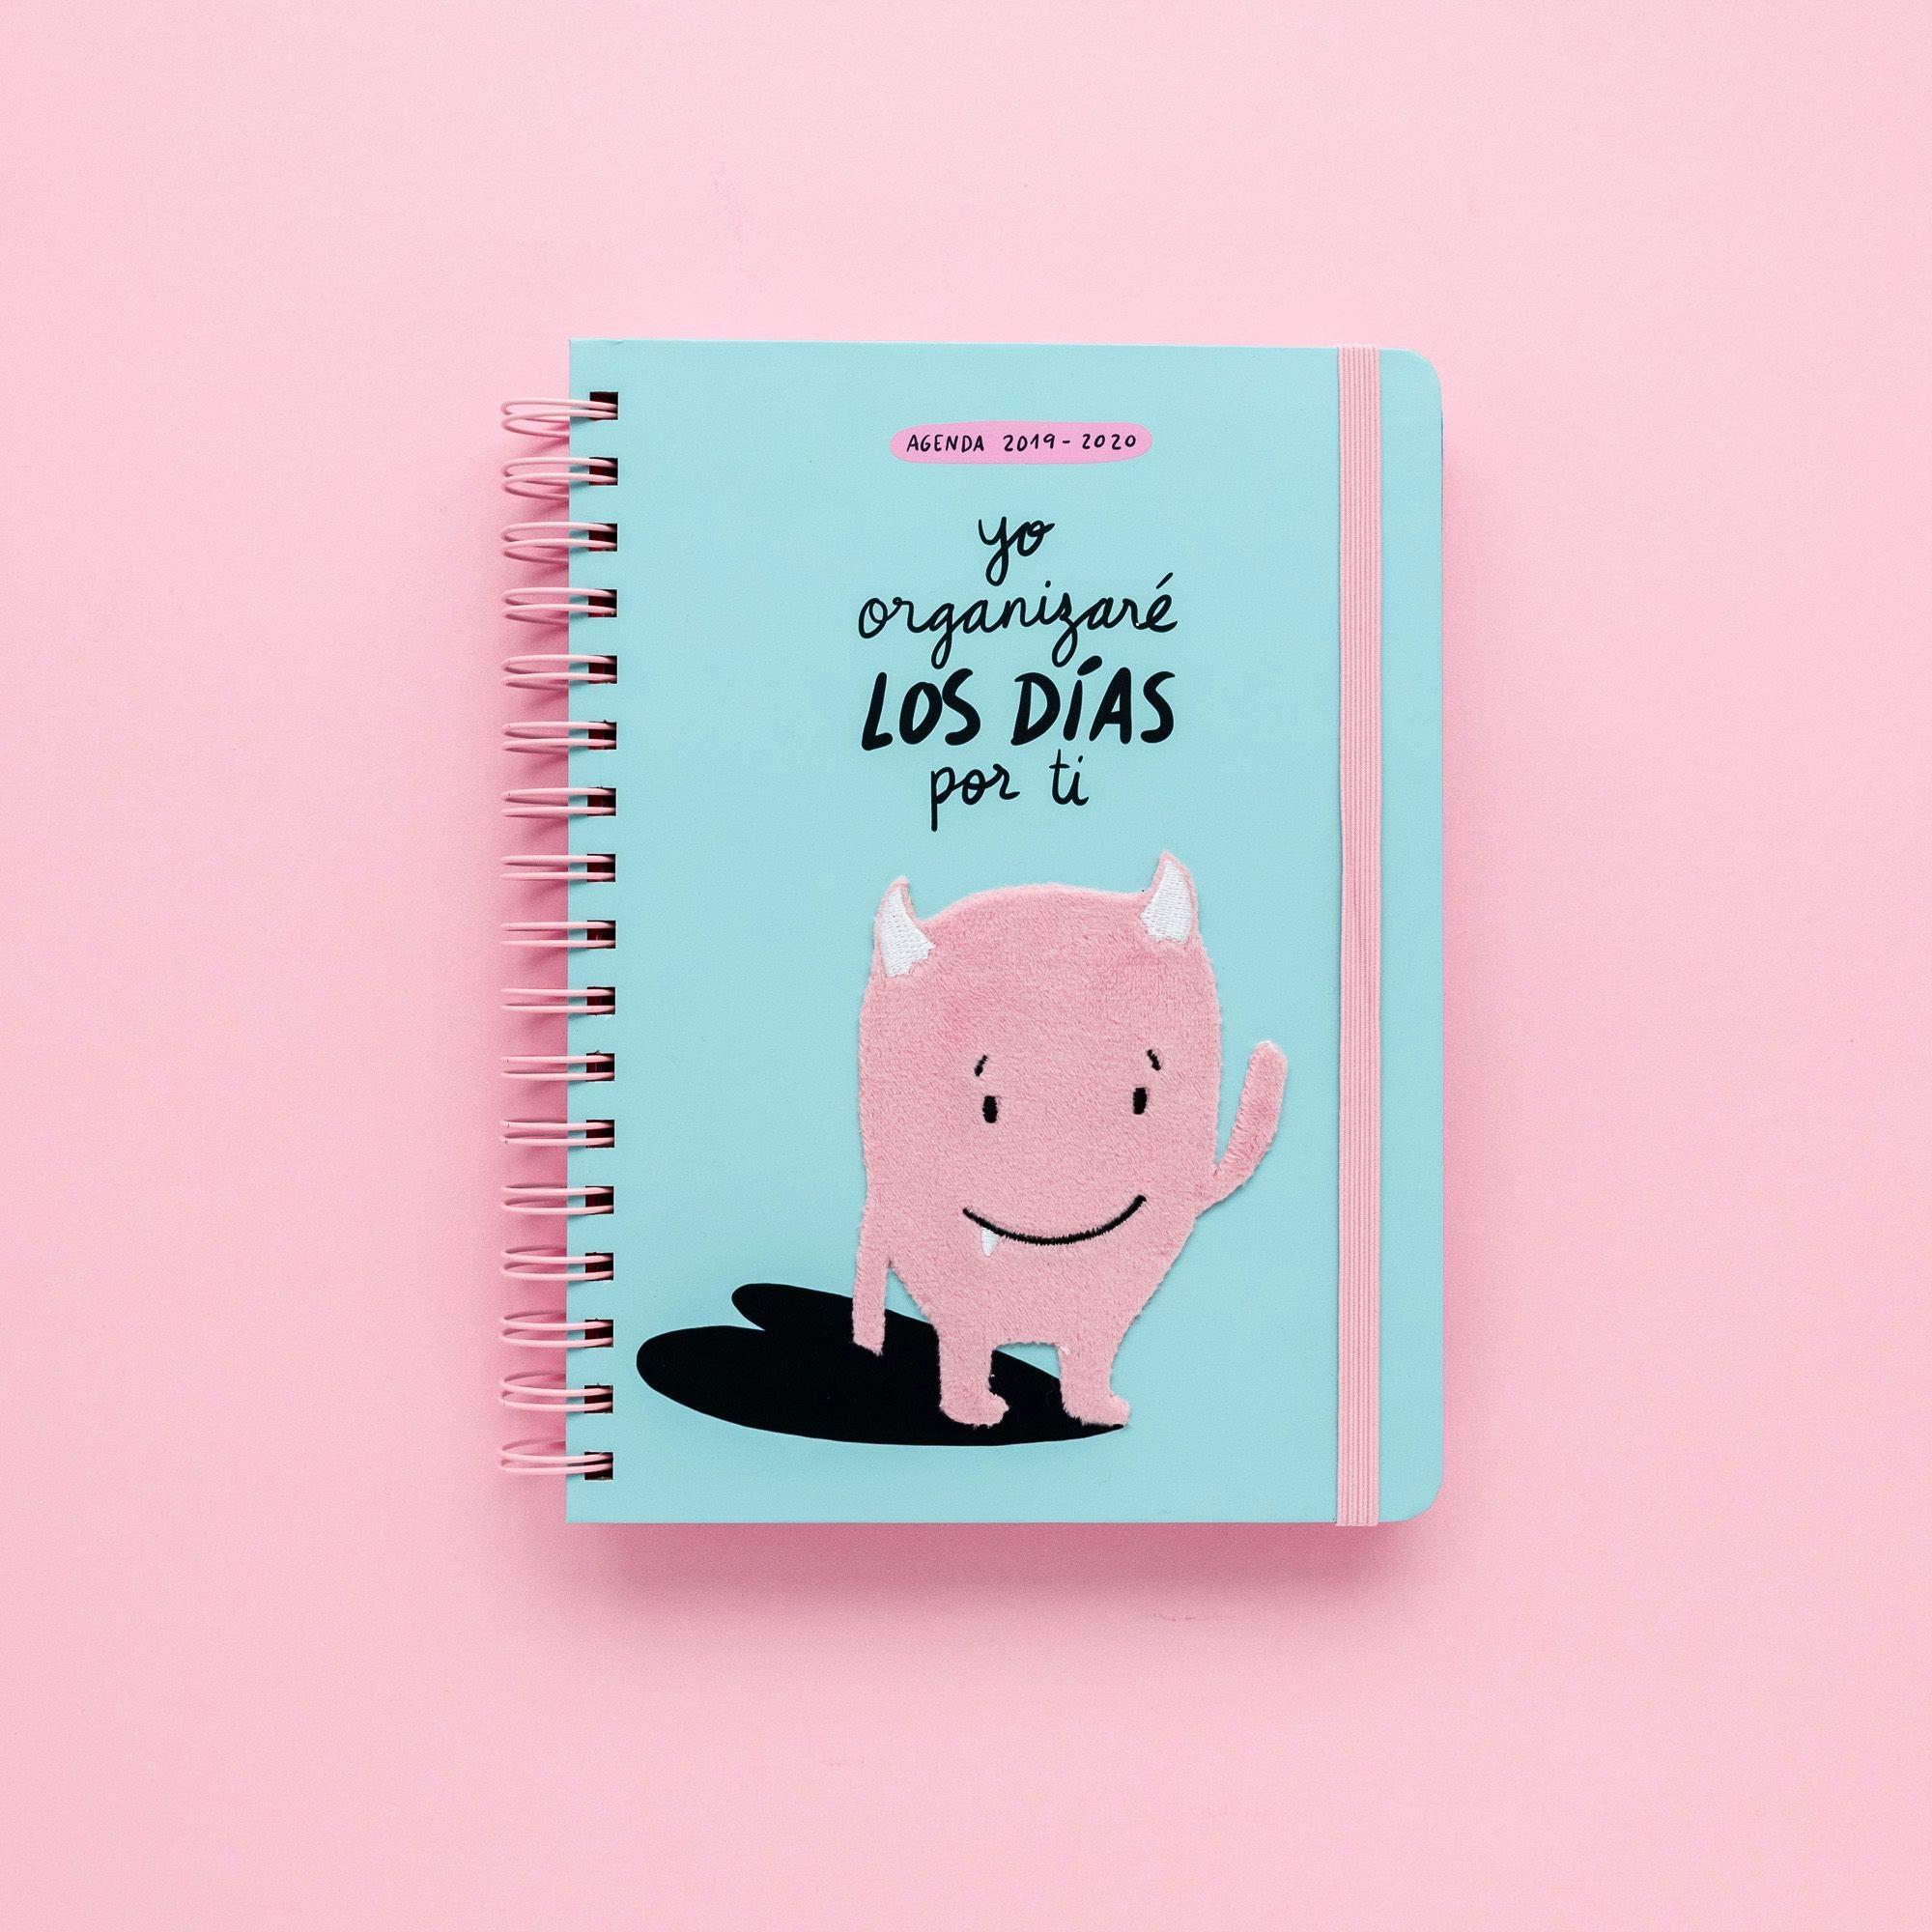 Amazon.com: Agenda escolar 2019-2020 Lyona (9788417166403 ...